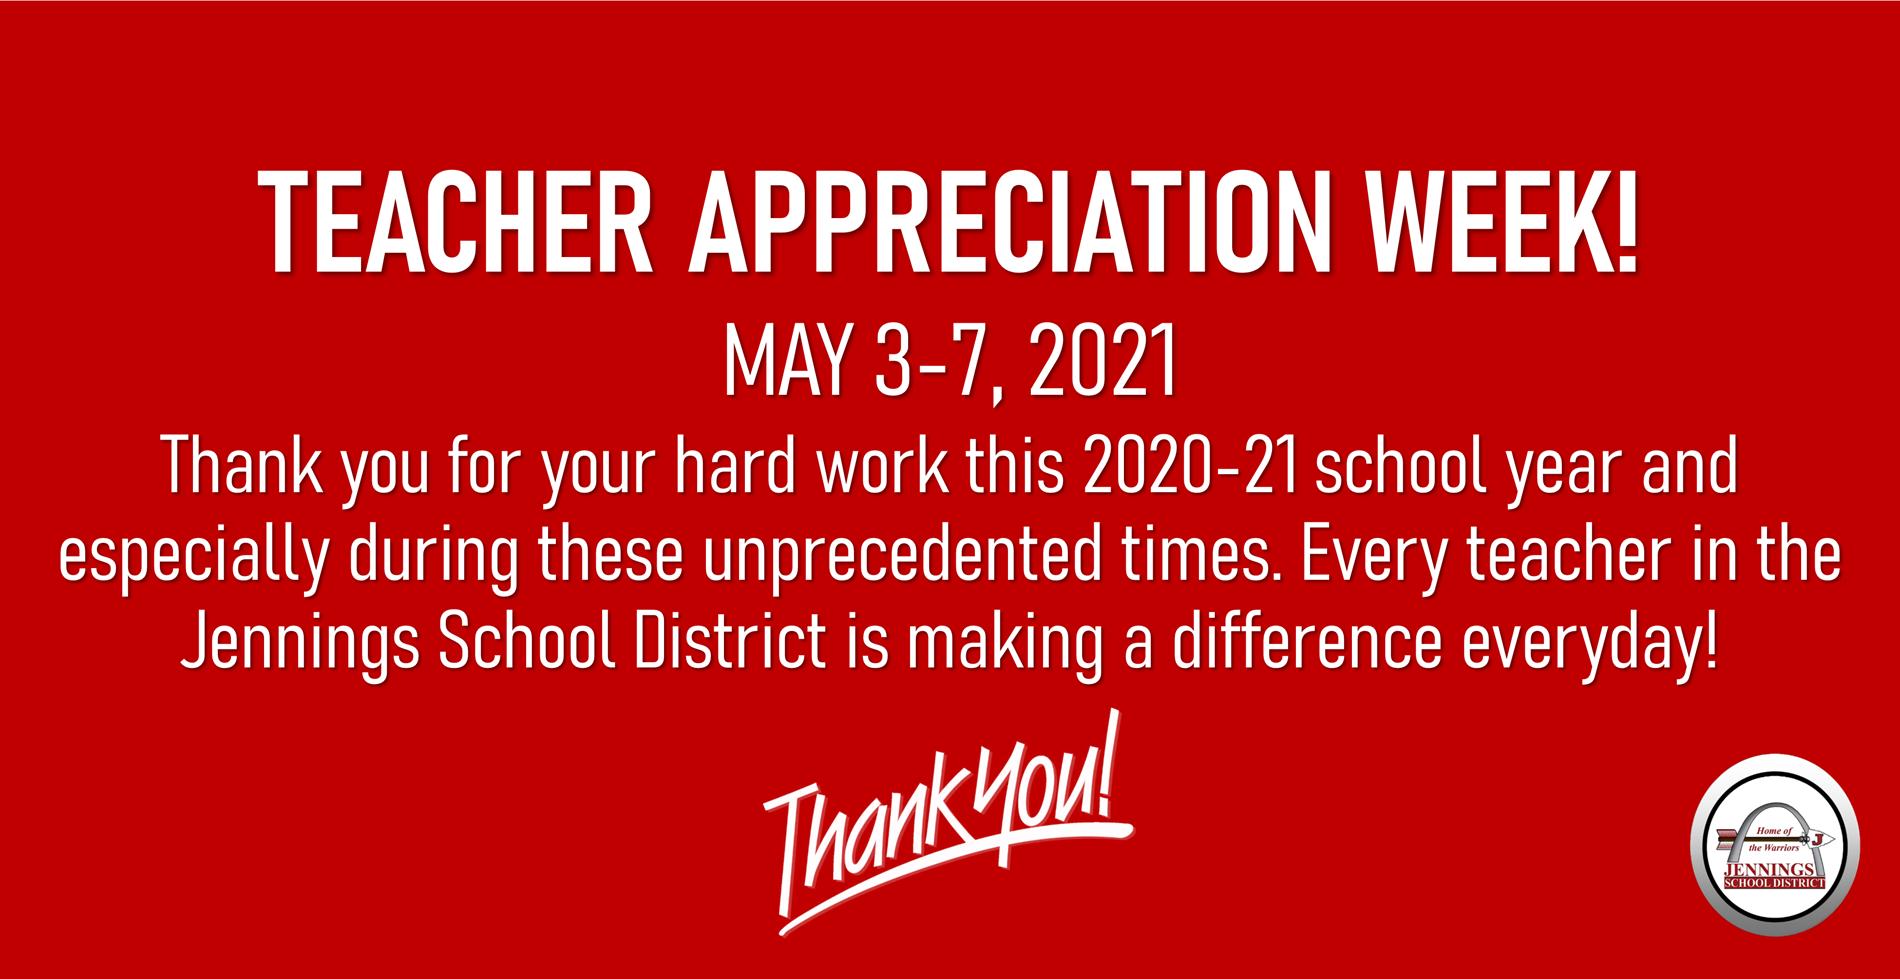 2021 teacher appreciation